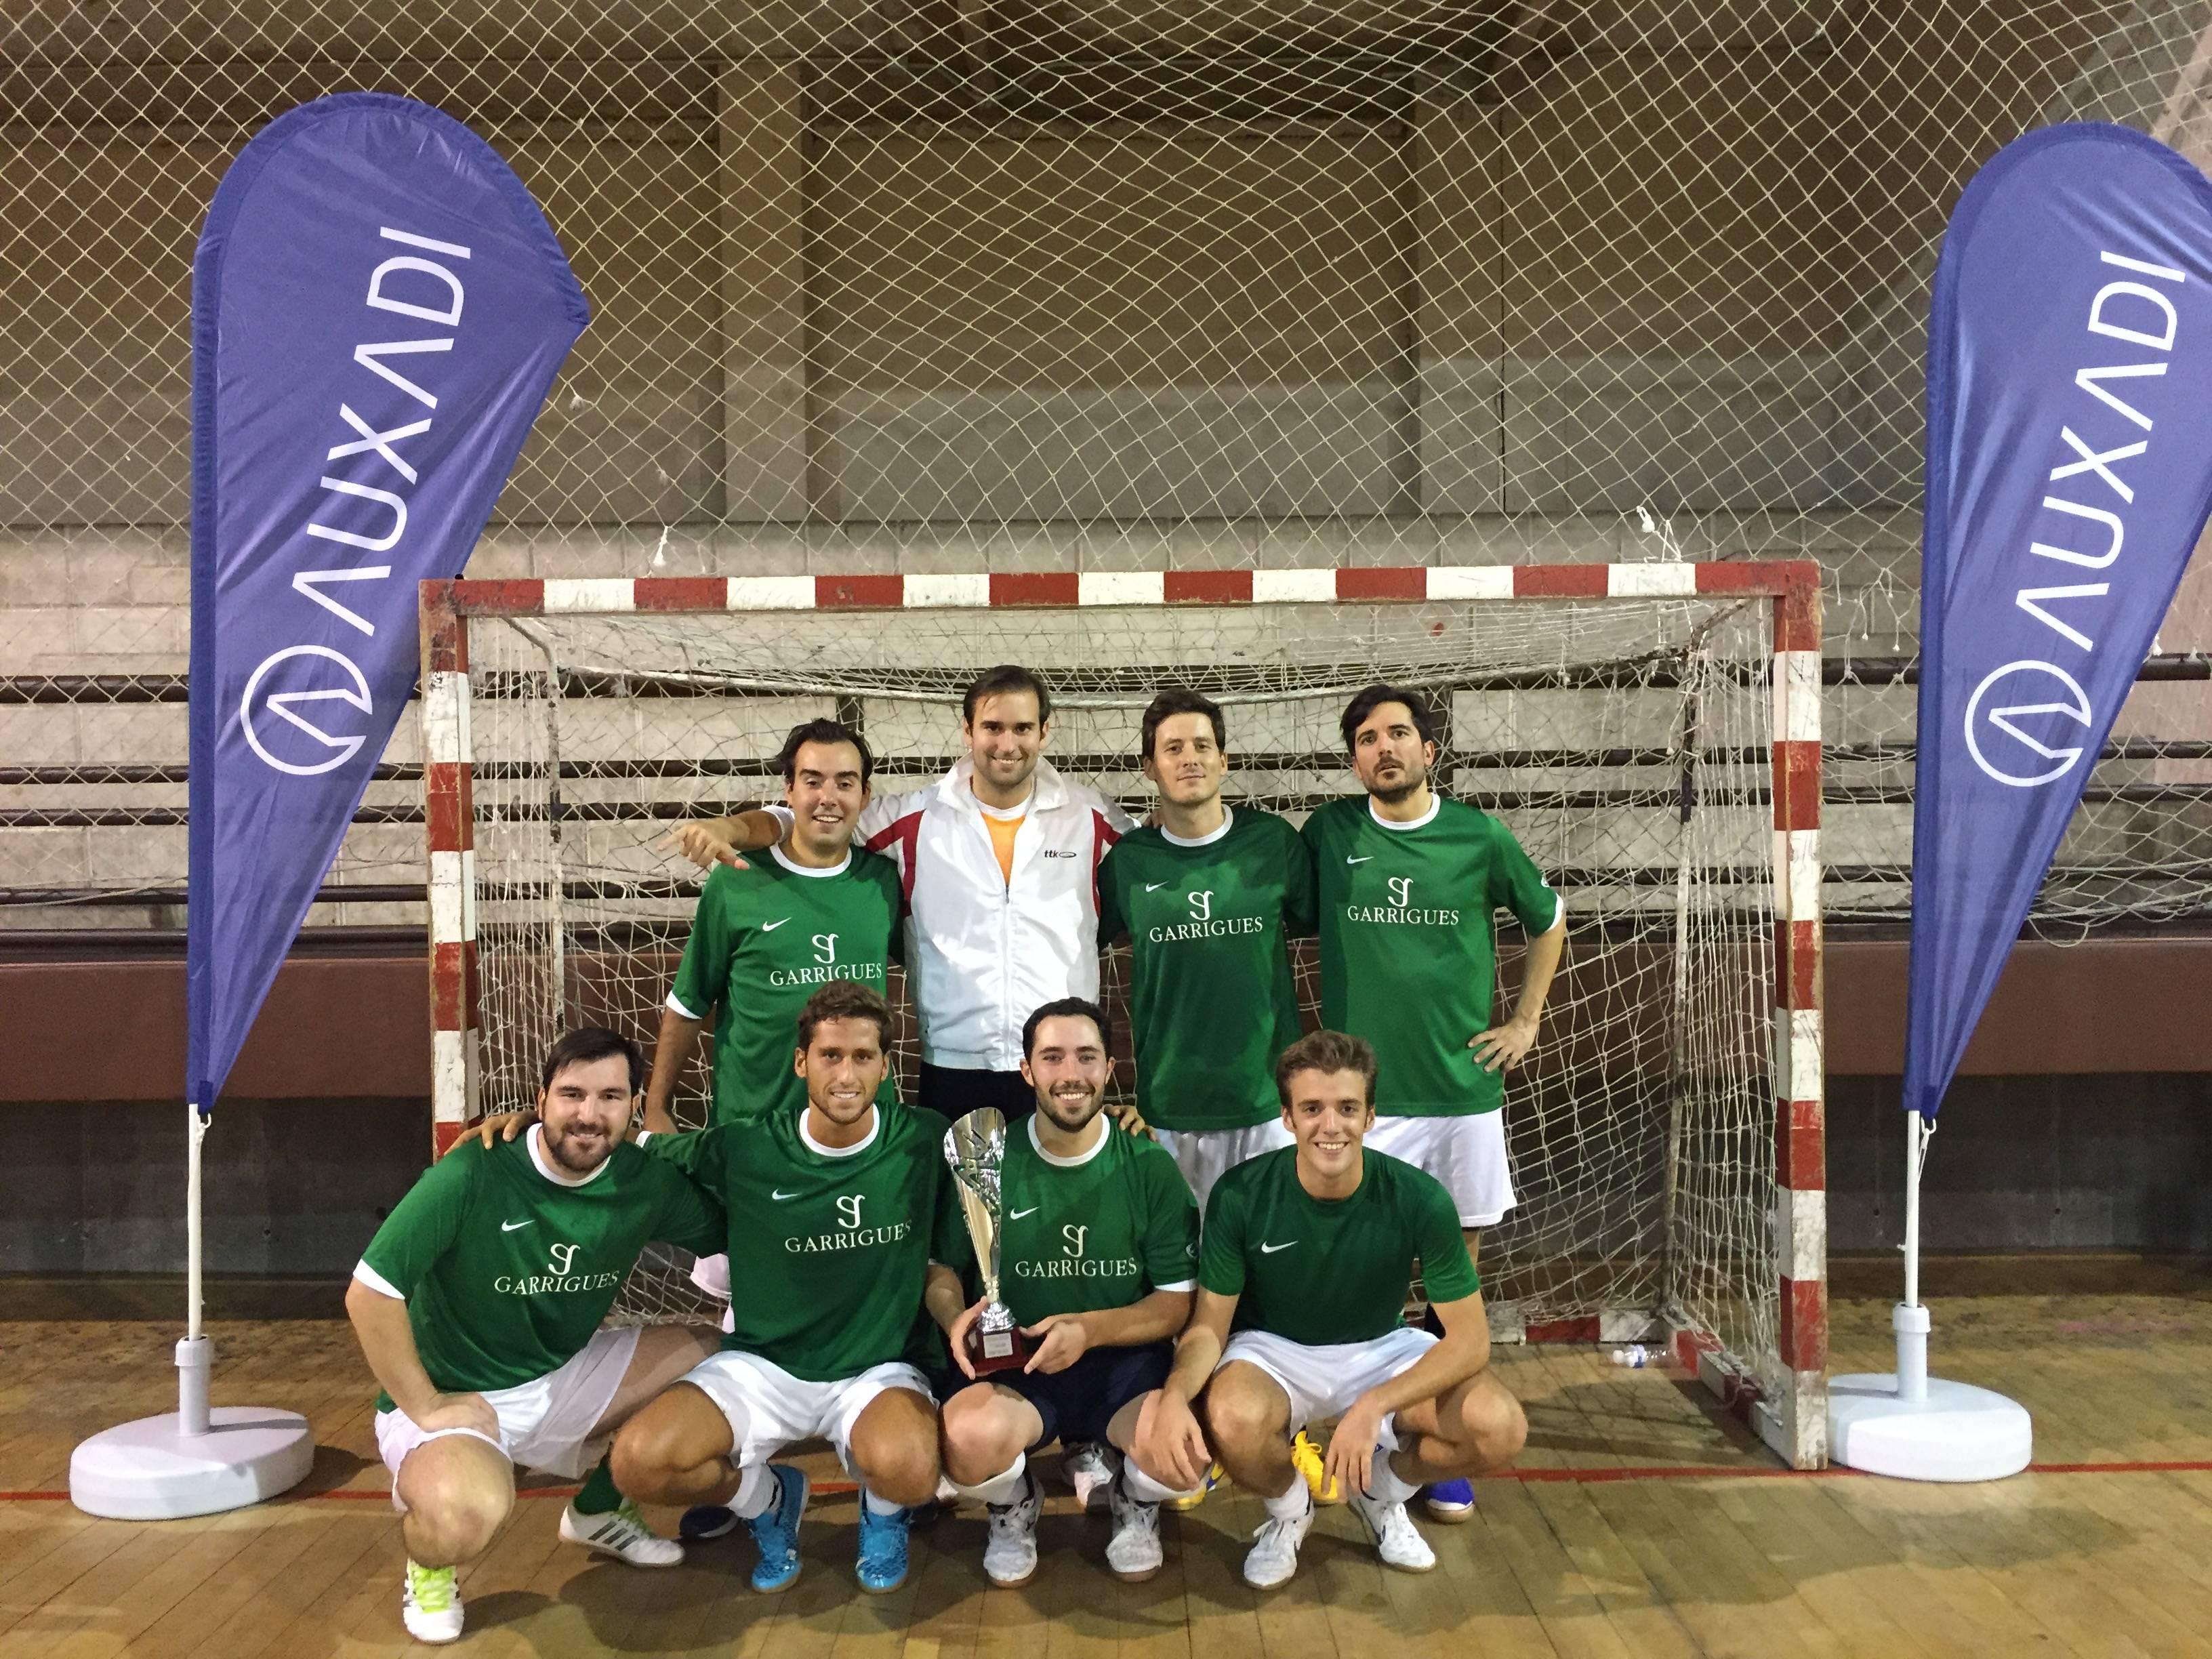 Garrigues ganadores Torneo Auxadi